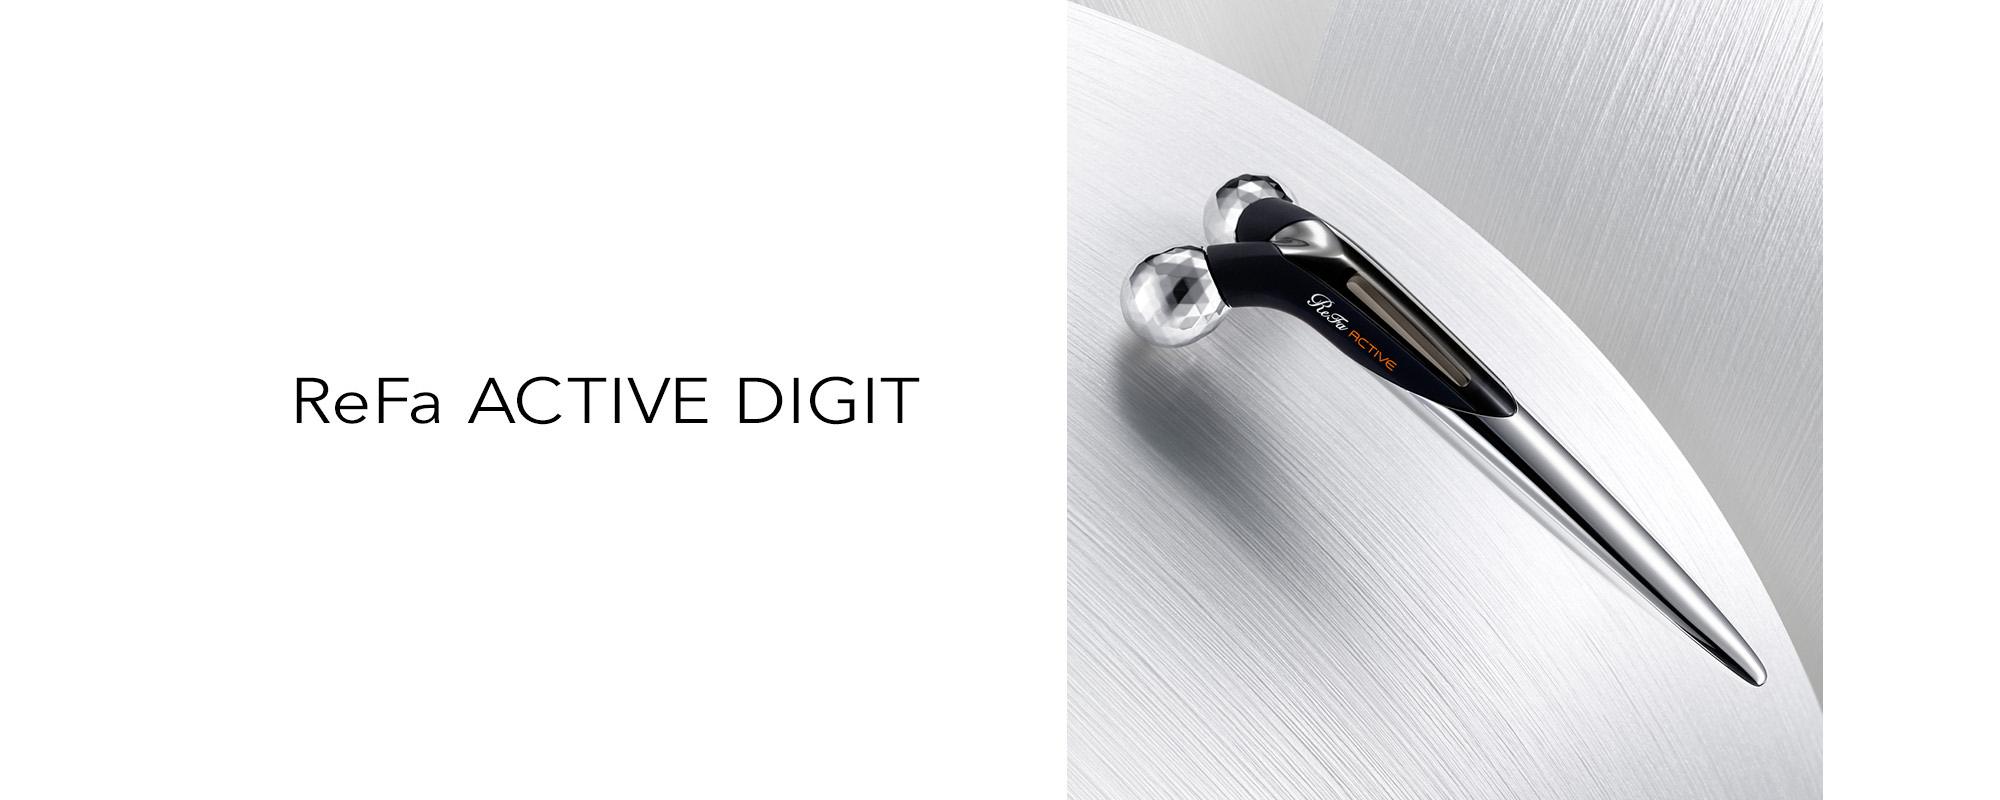 Refa Active Digit Products Mtg Co Ltd